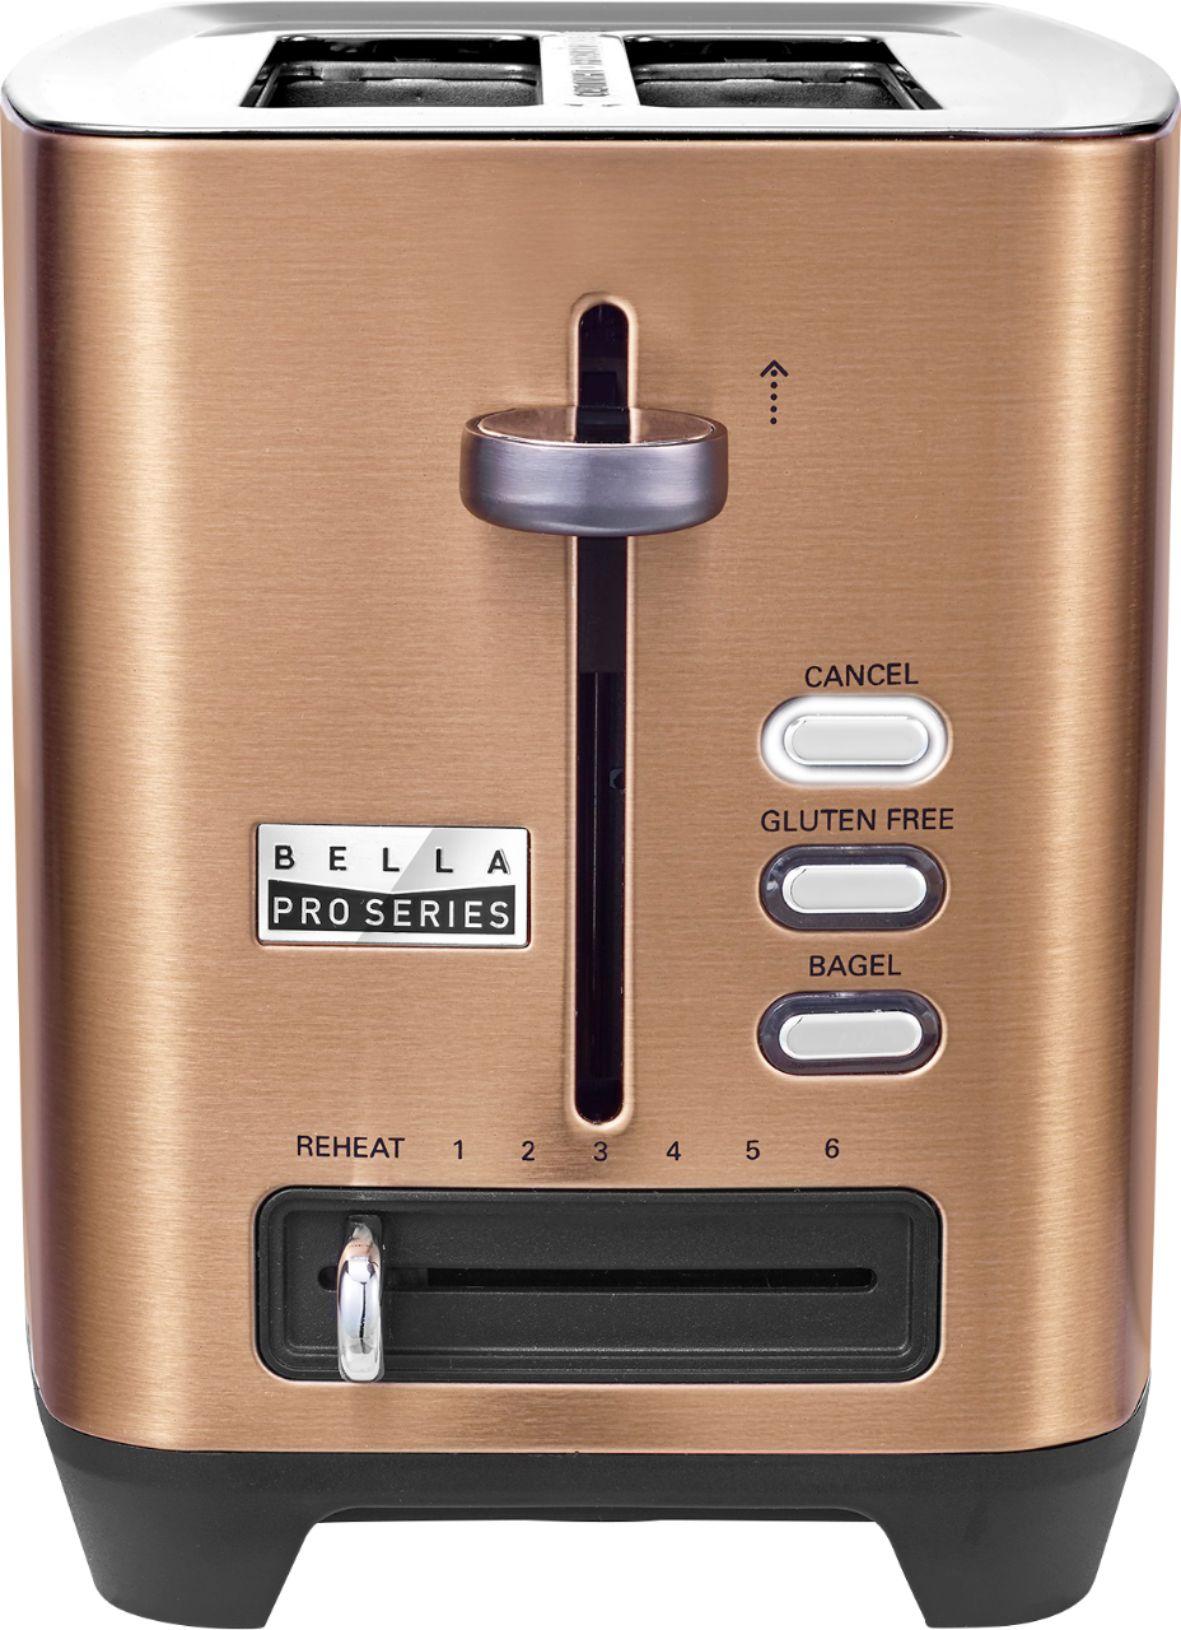 Bella - Pro Series 2-Slice Extra-Wide-Slot Toaster - Copper - $24.99